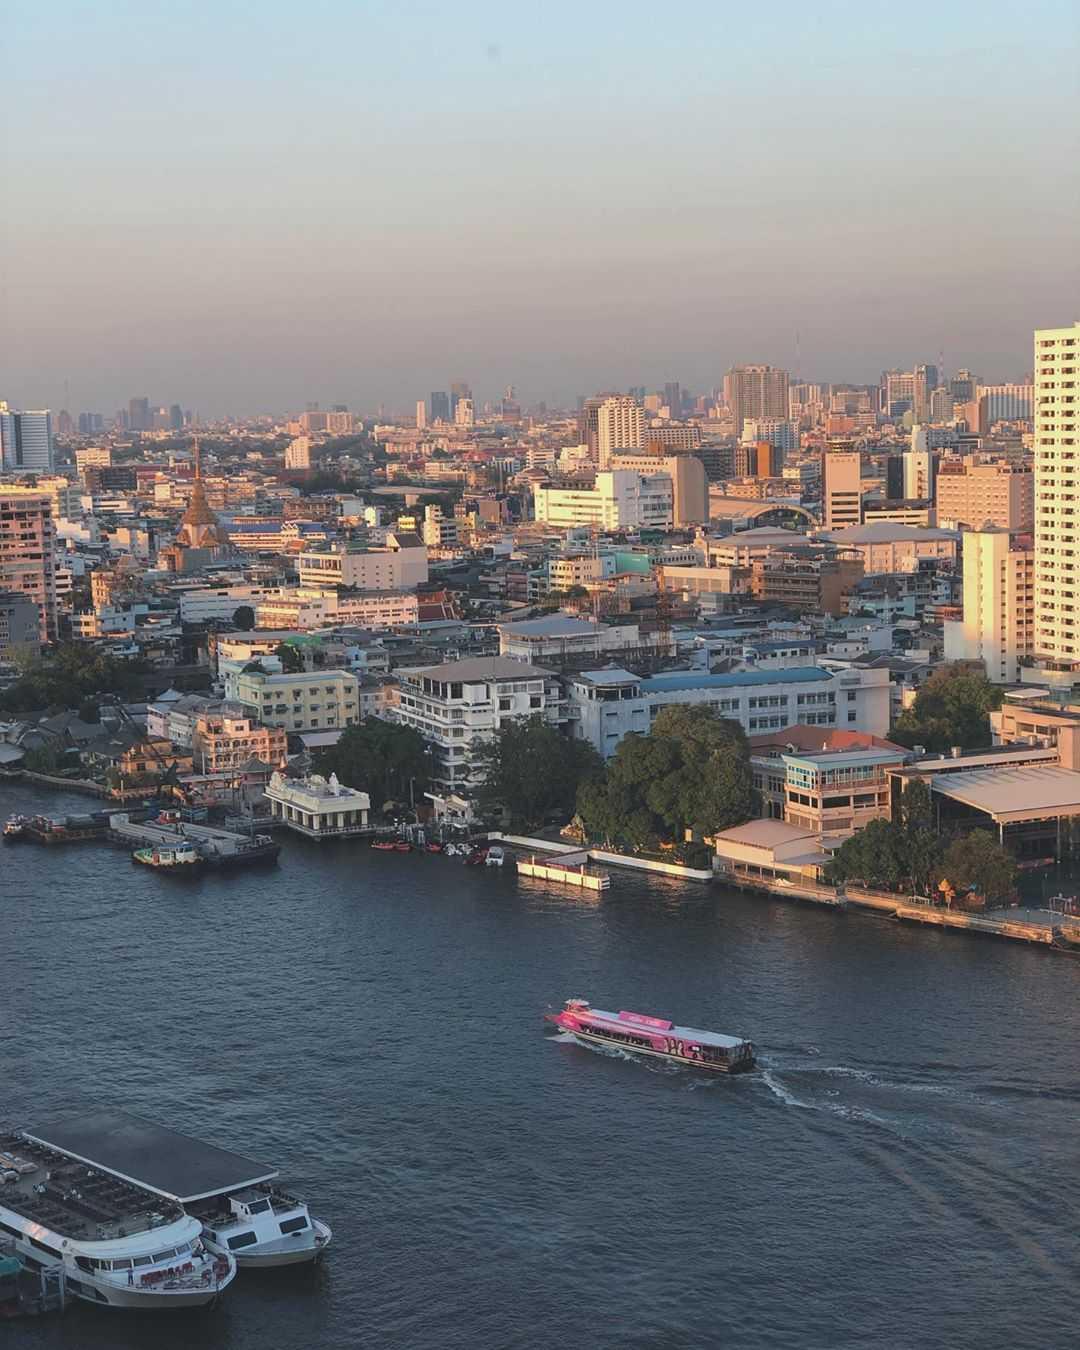 Uitzicht over de Chao Phraya rivier in Bangkok ThreeSixty Jazz Lounge and Rooftop Bar (Millennium Hilton Bangkok)